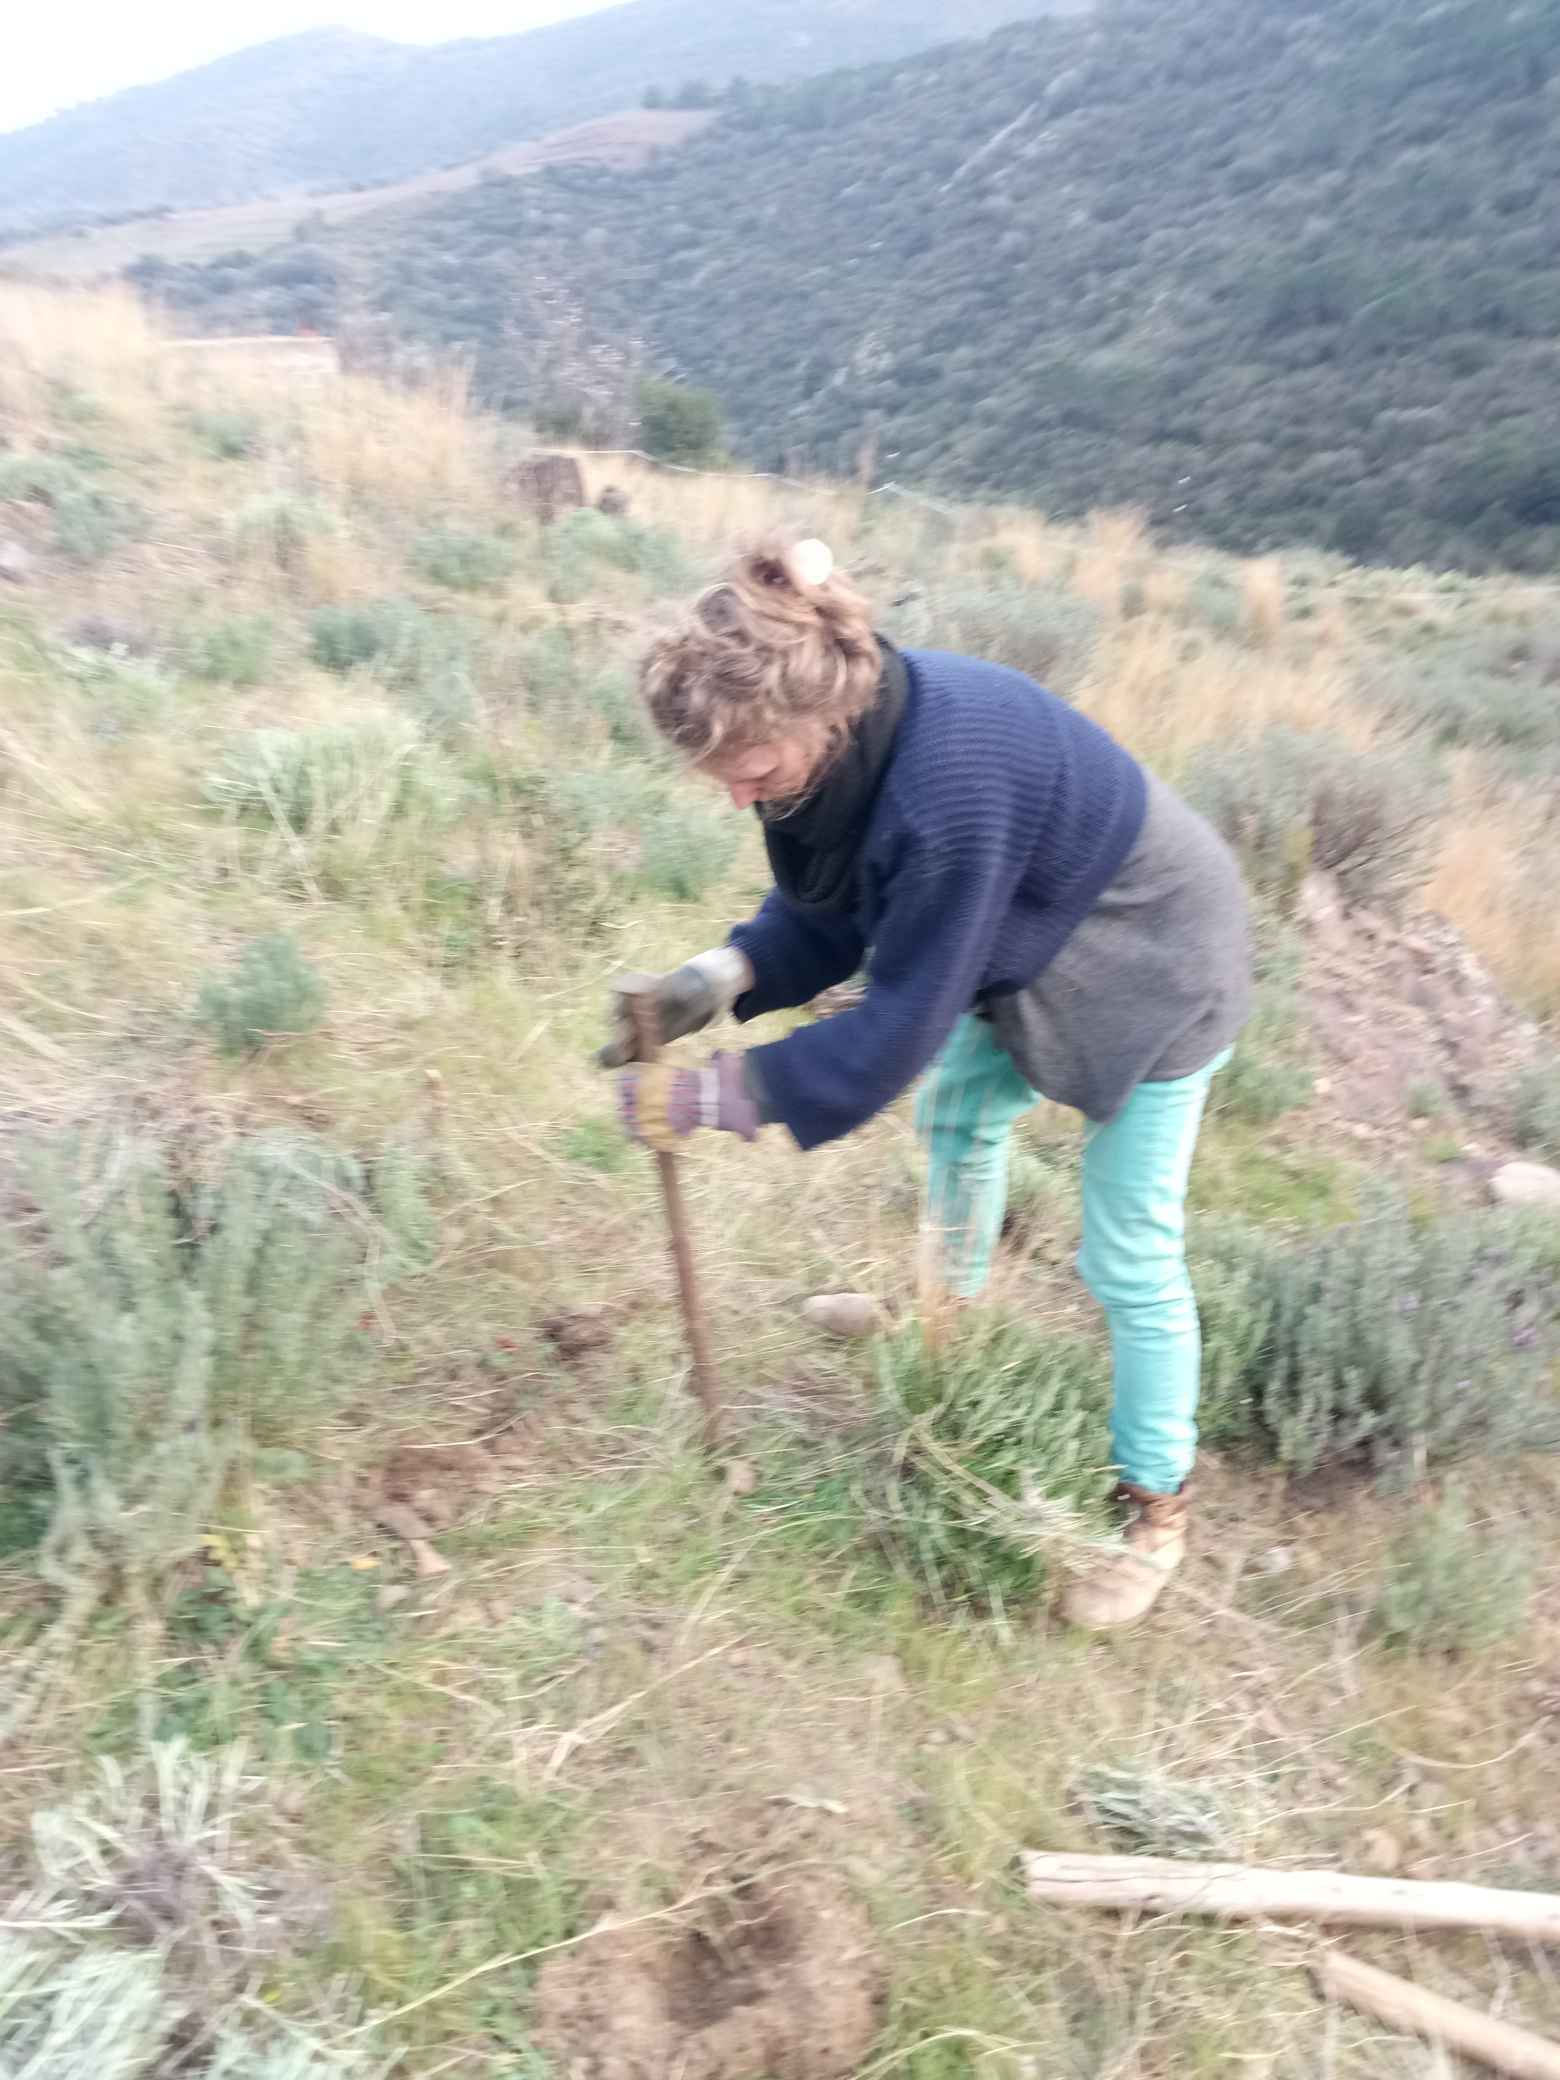 Planting the forbidden vines.